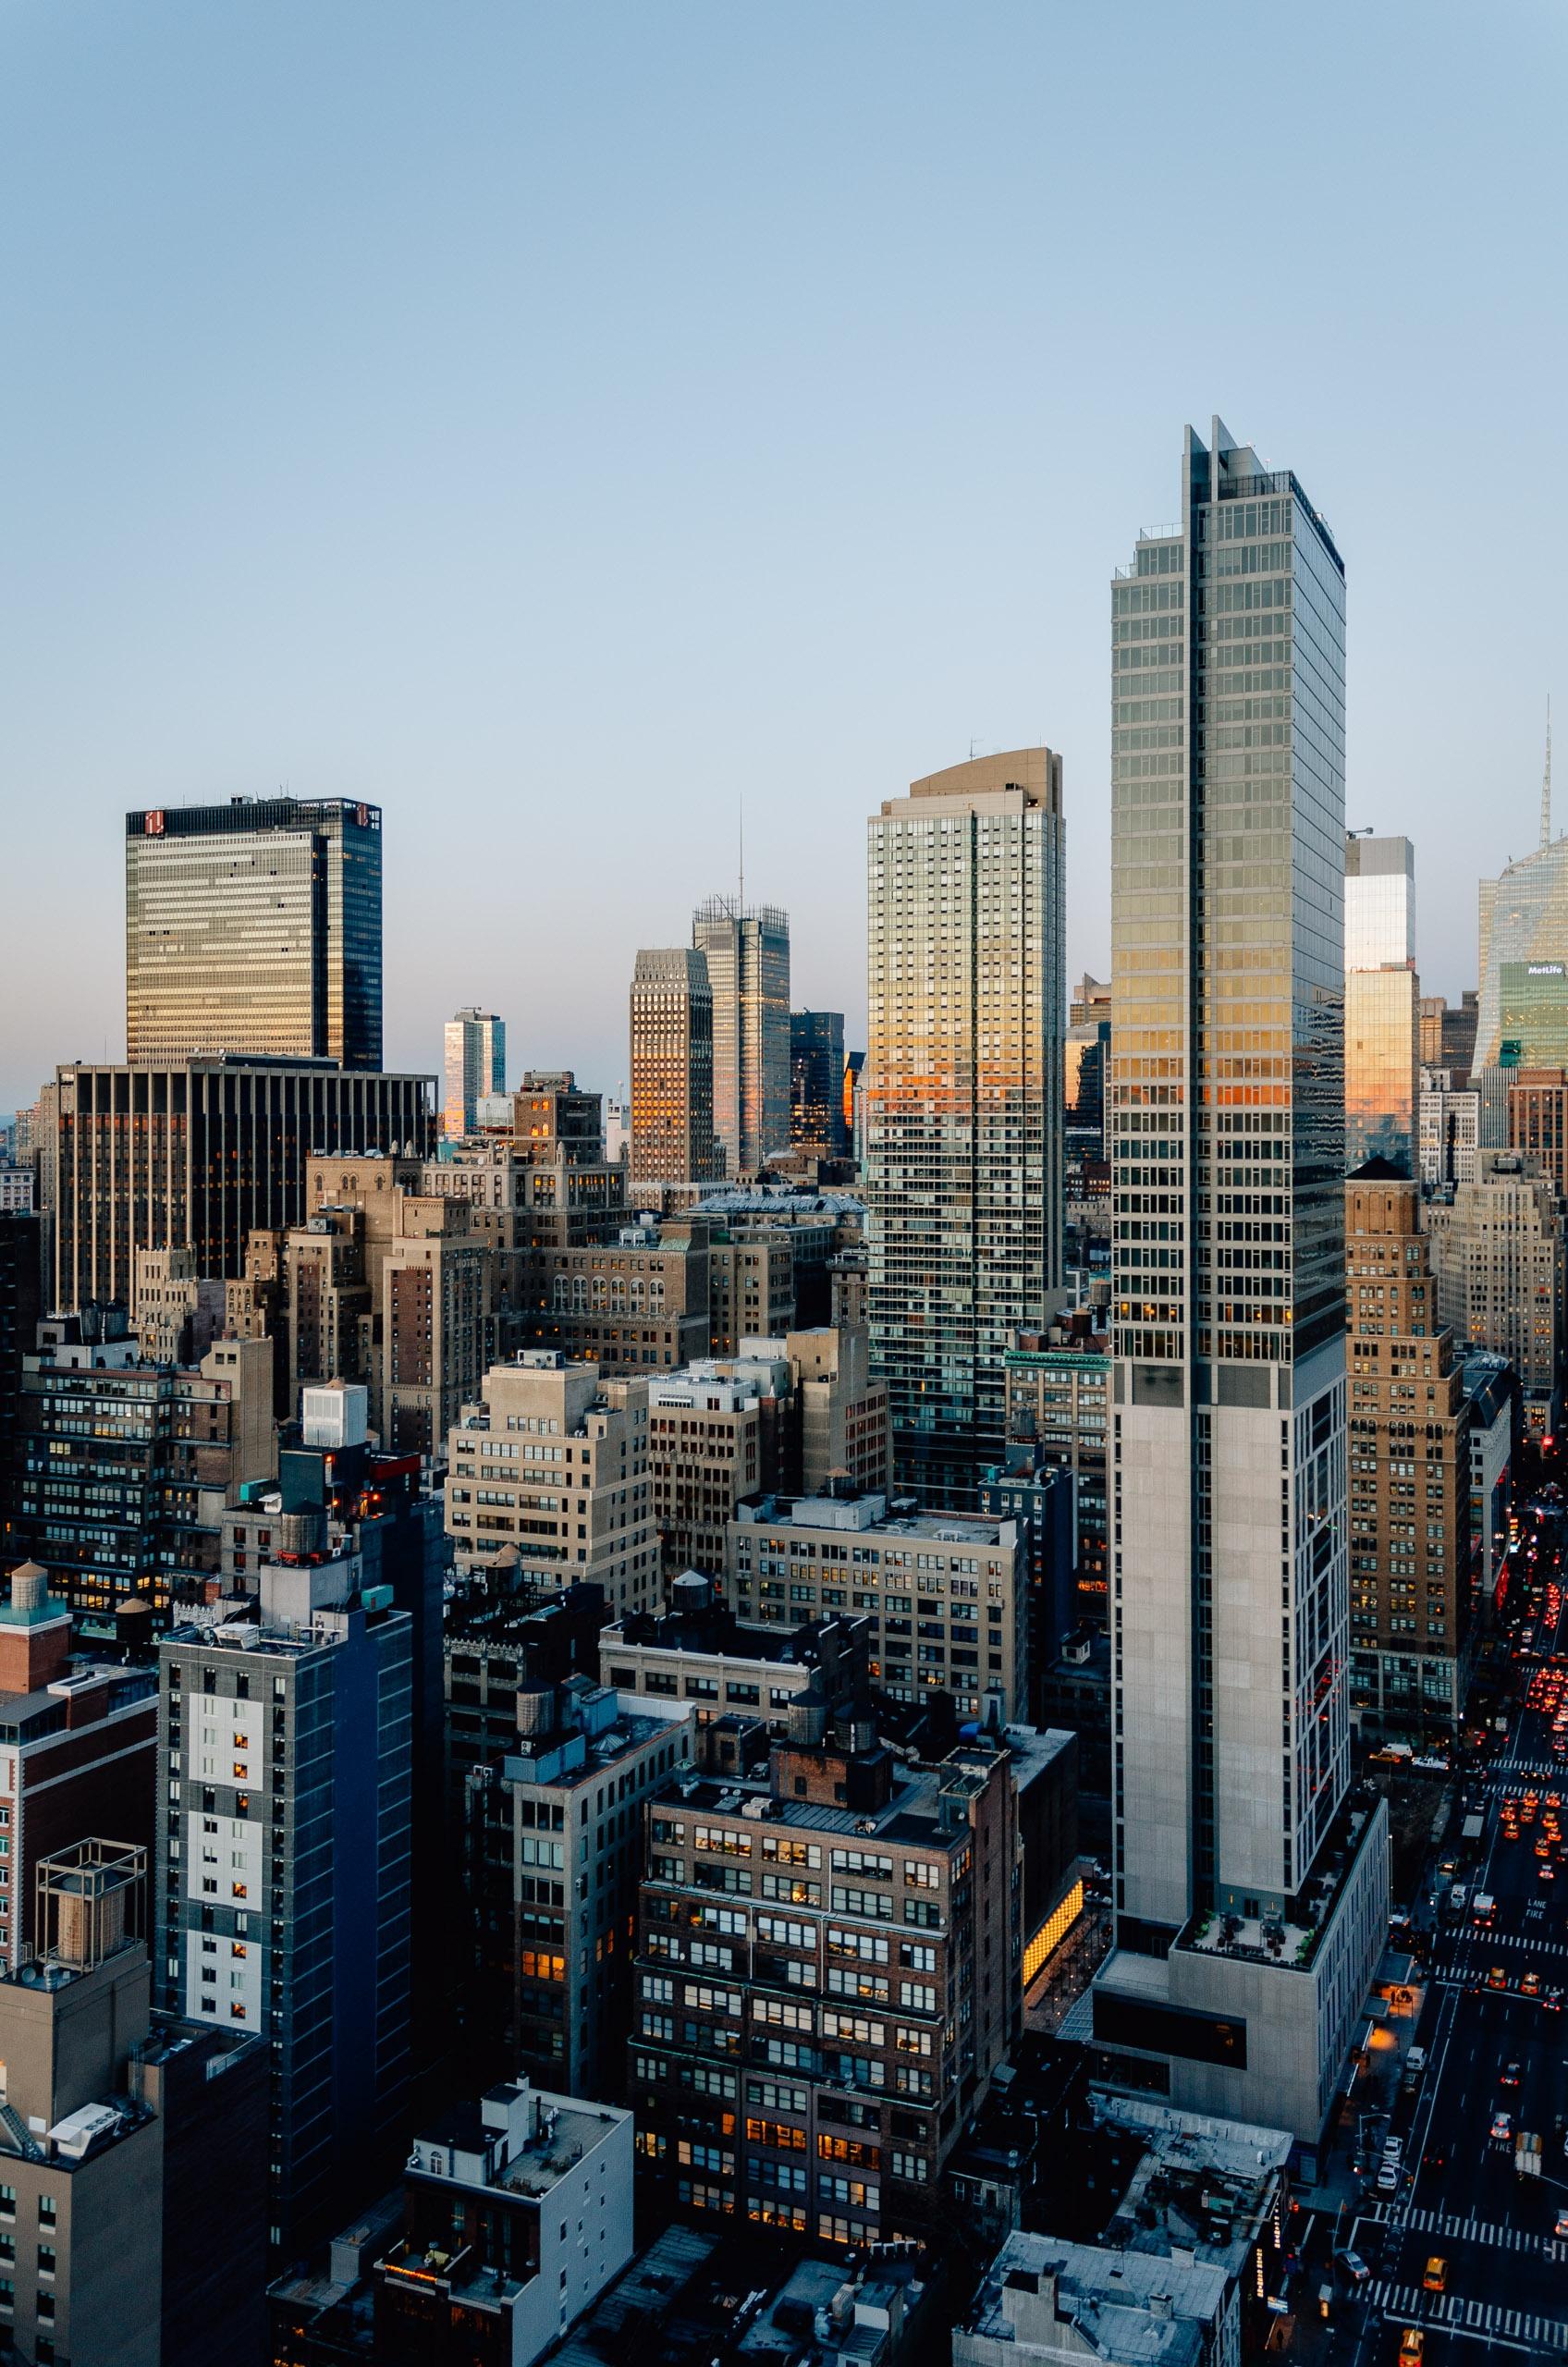 New York City - 2010-1220-DSC_0048_56915